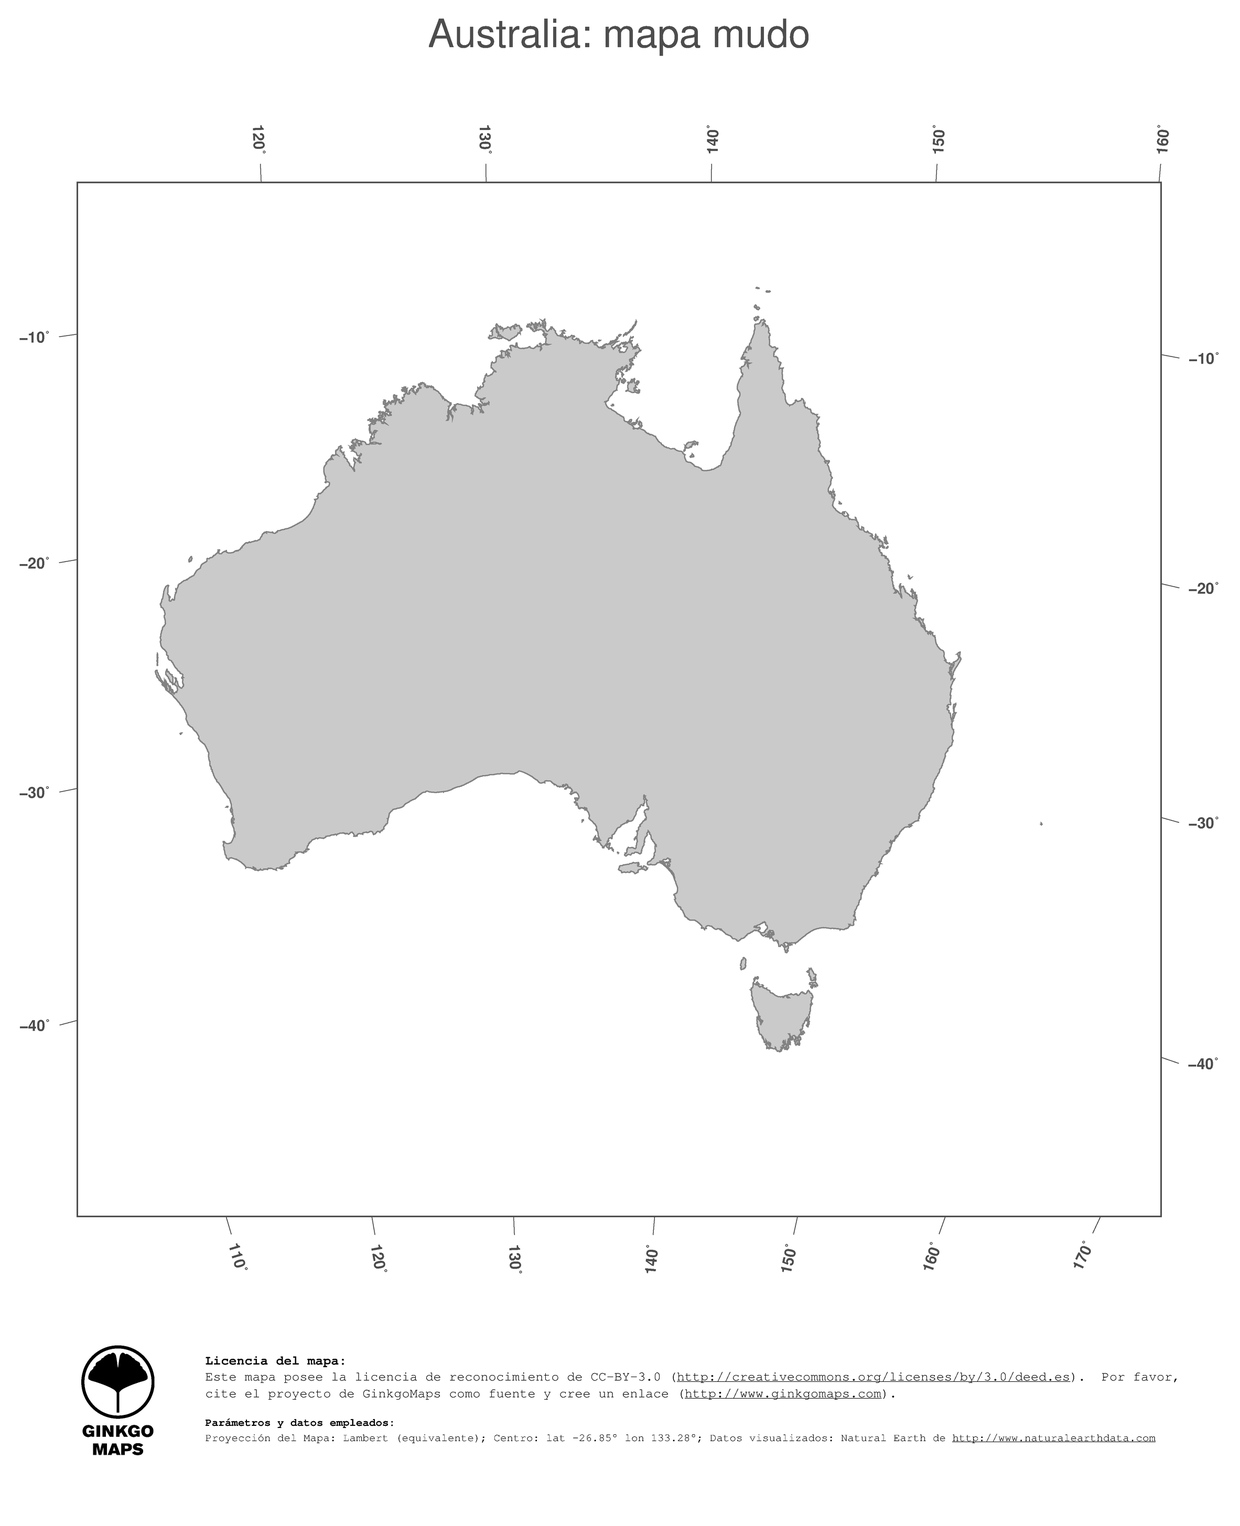 Mapa Australia mapas coleccin continente Oceana record Australia